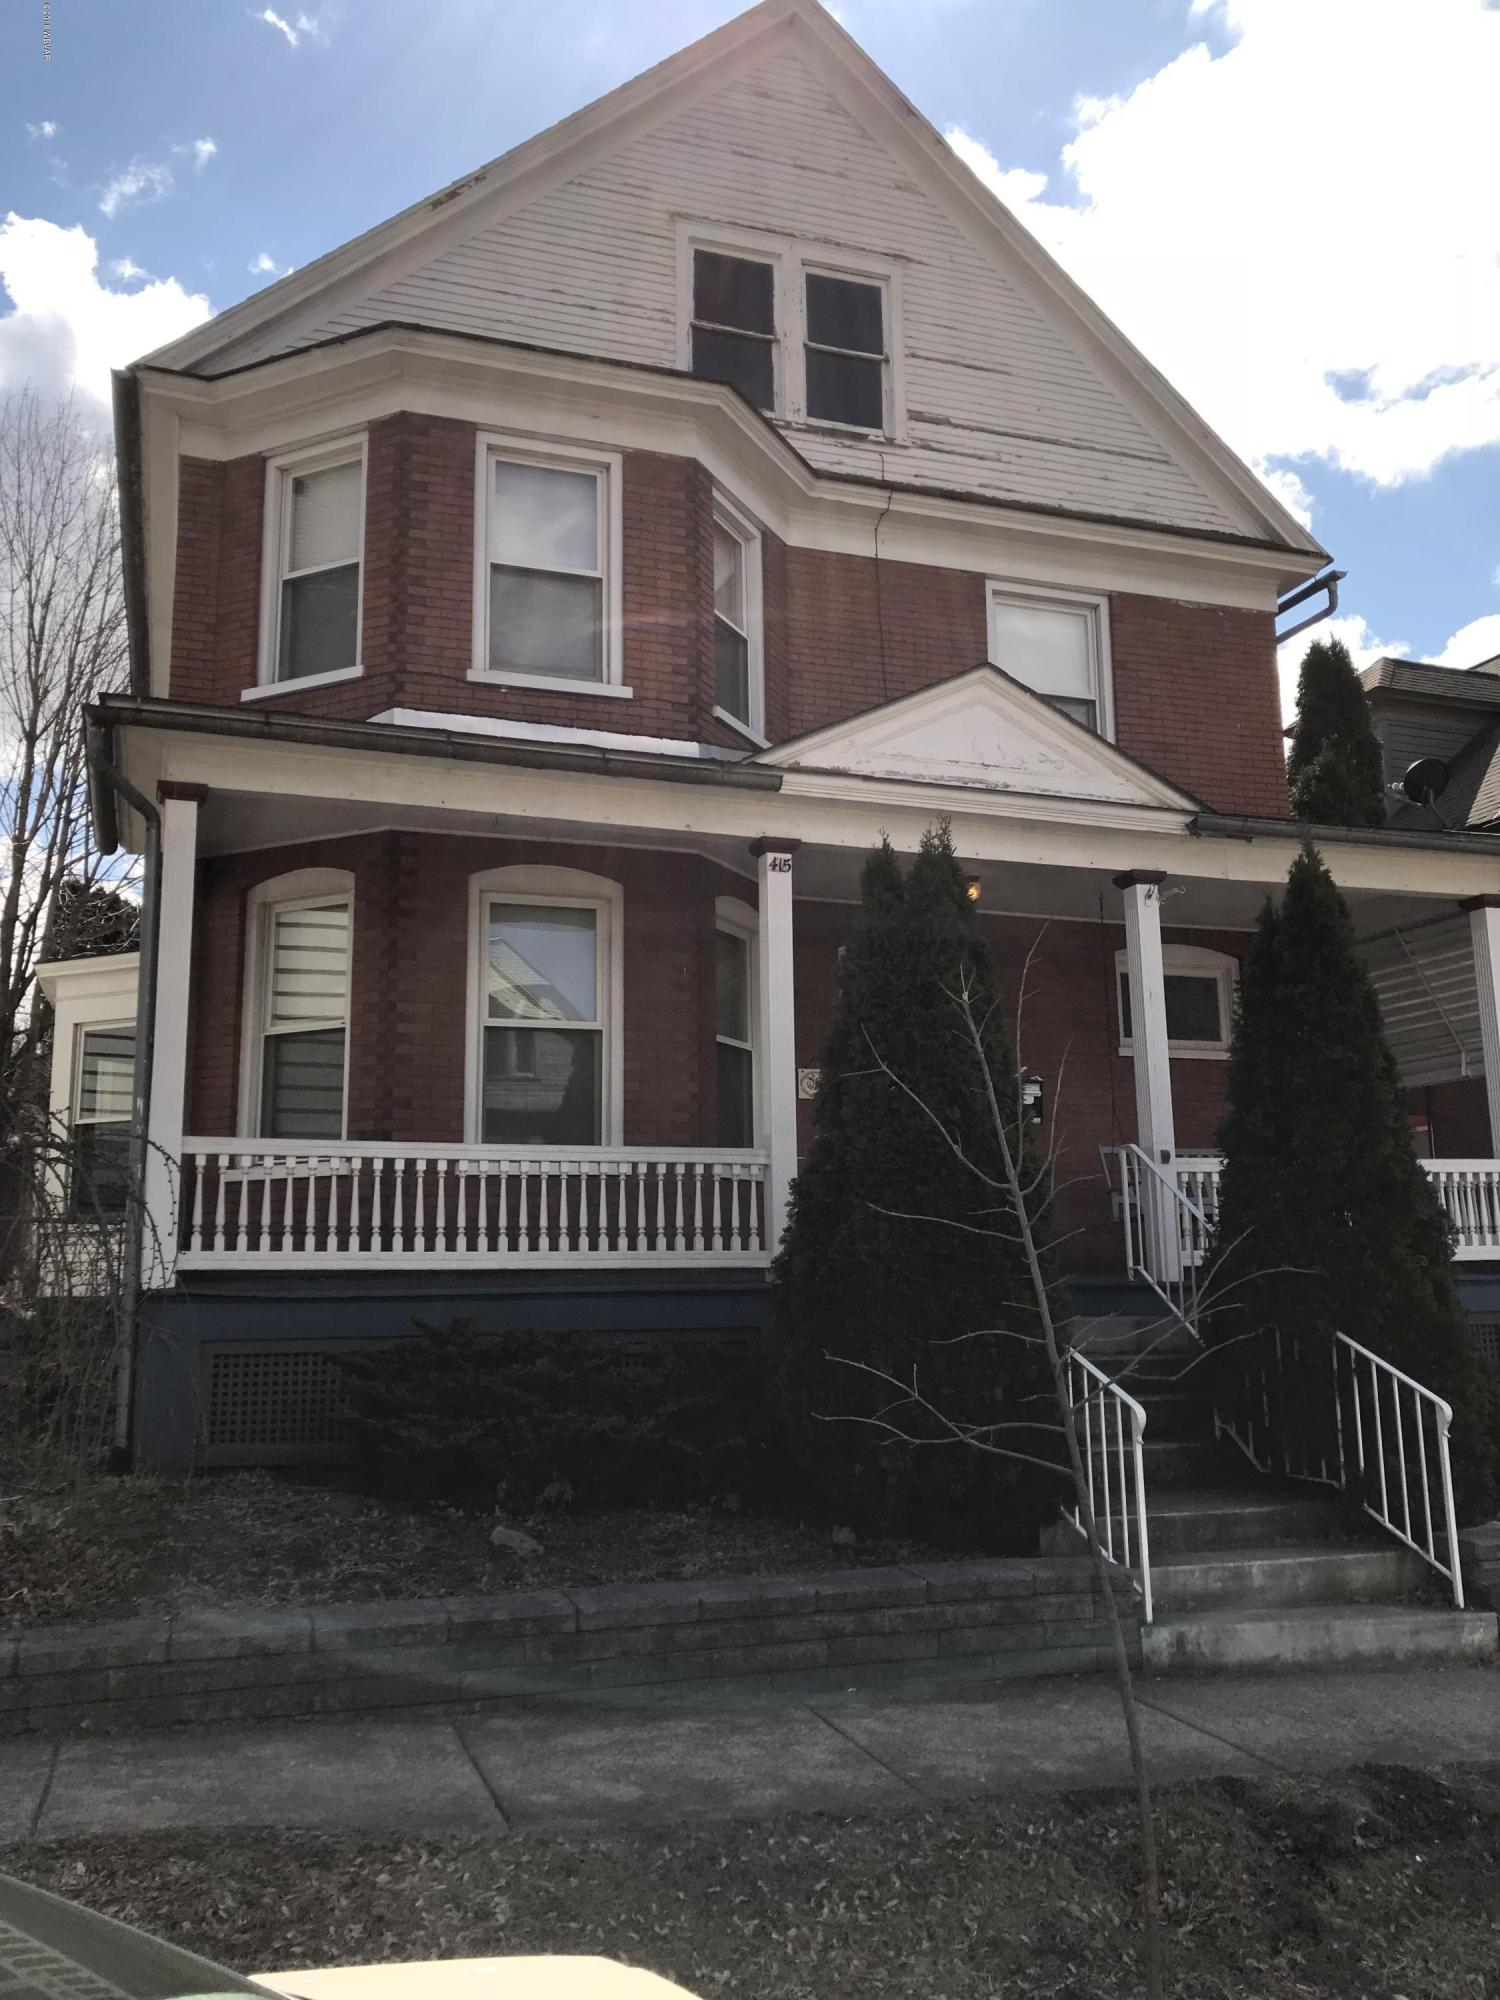 415 BRANDON AVENUE,Williamsport,PA 17701,3 Bedrooms Bedrooms,3 BathroomsBathrooms,Resid-lease/rental,BRANDON,WB-88001